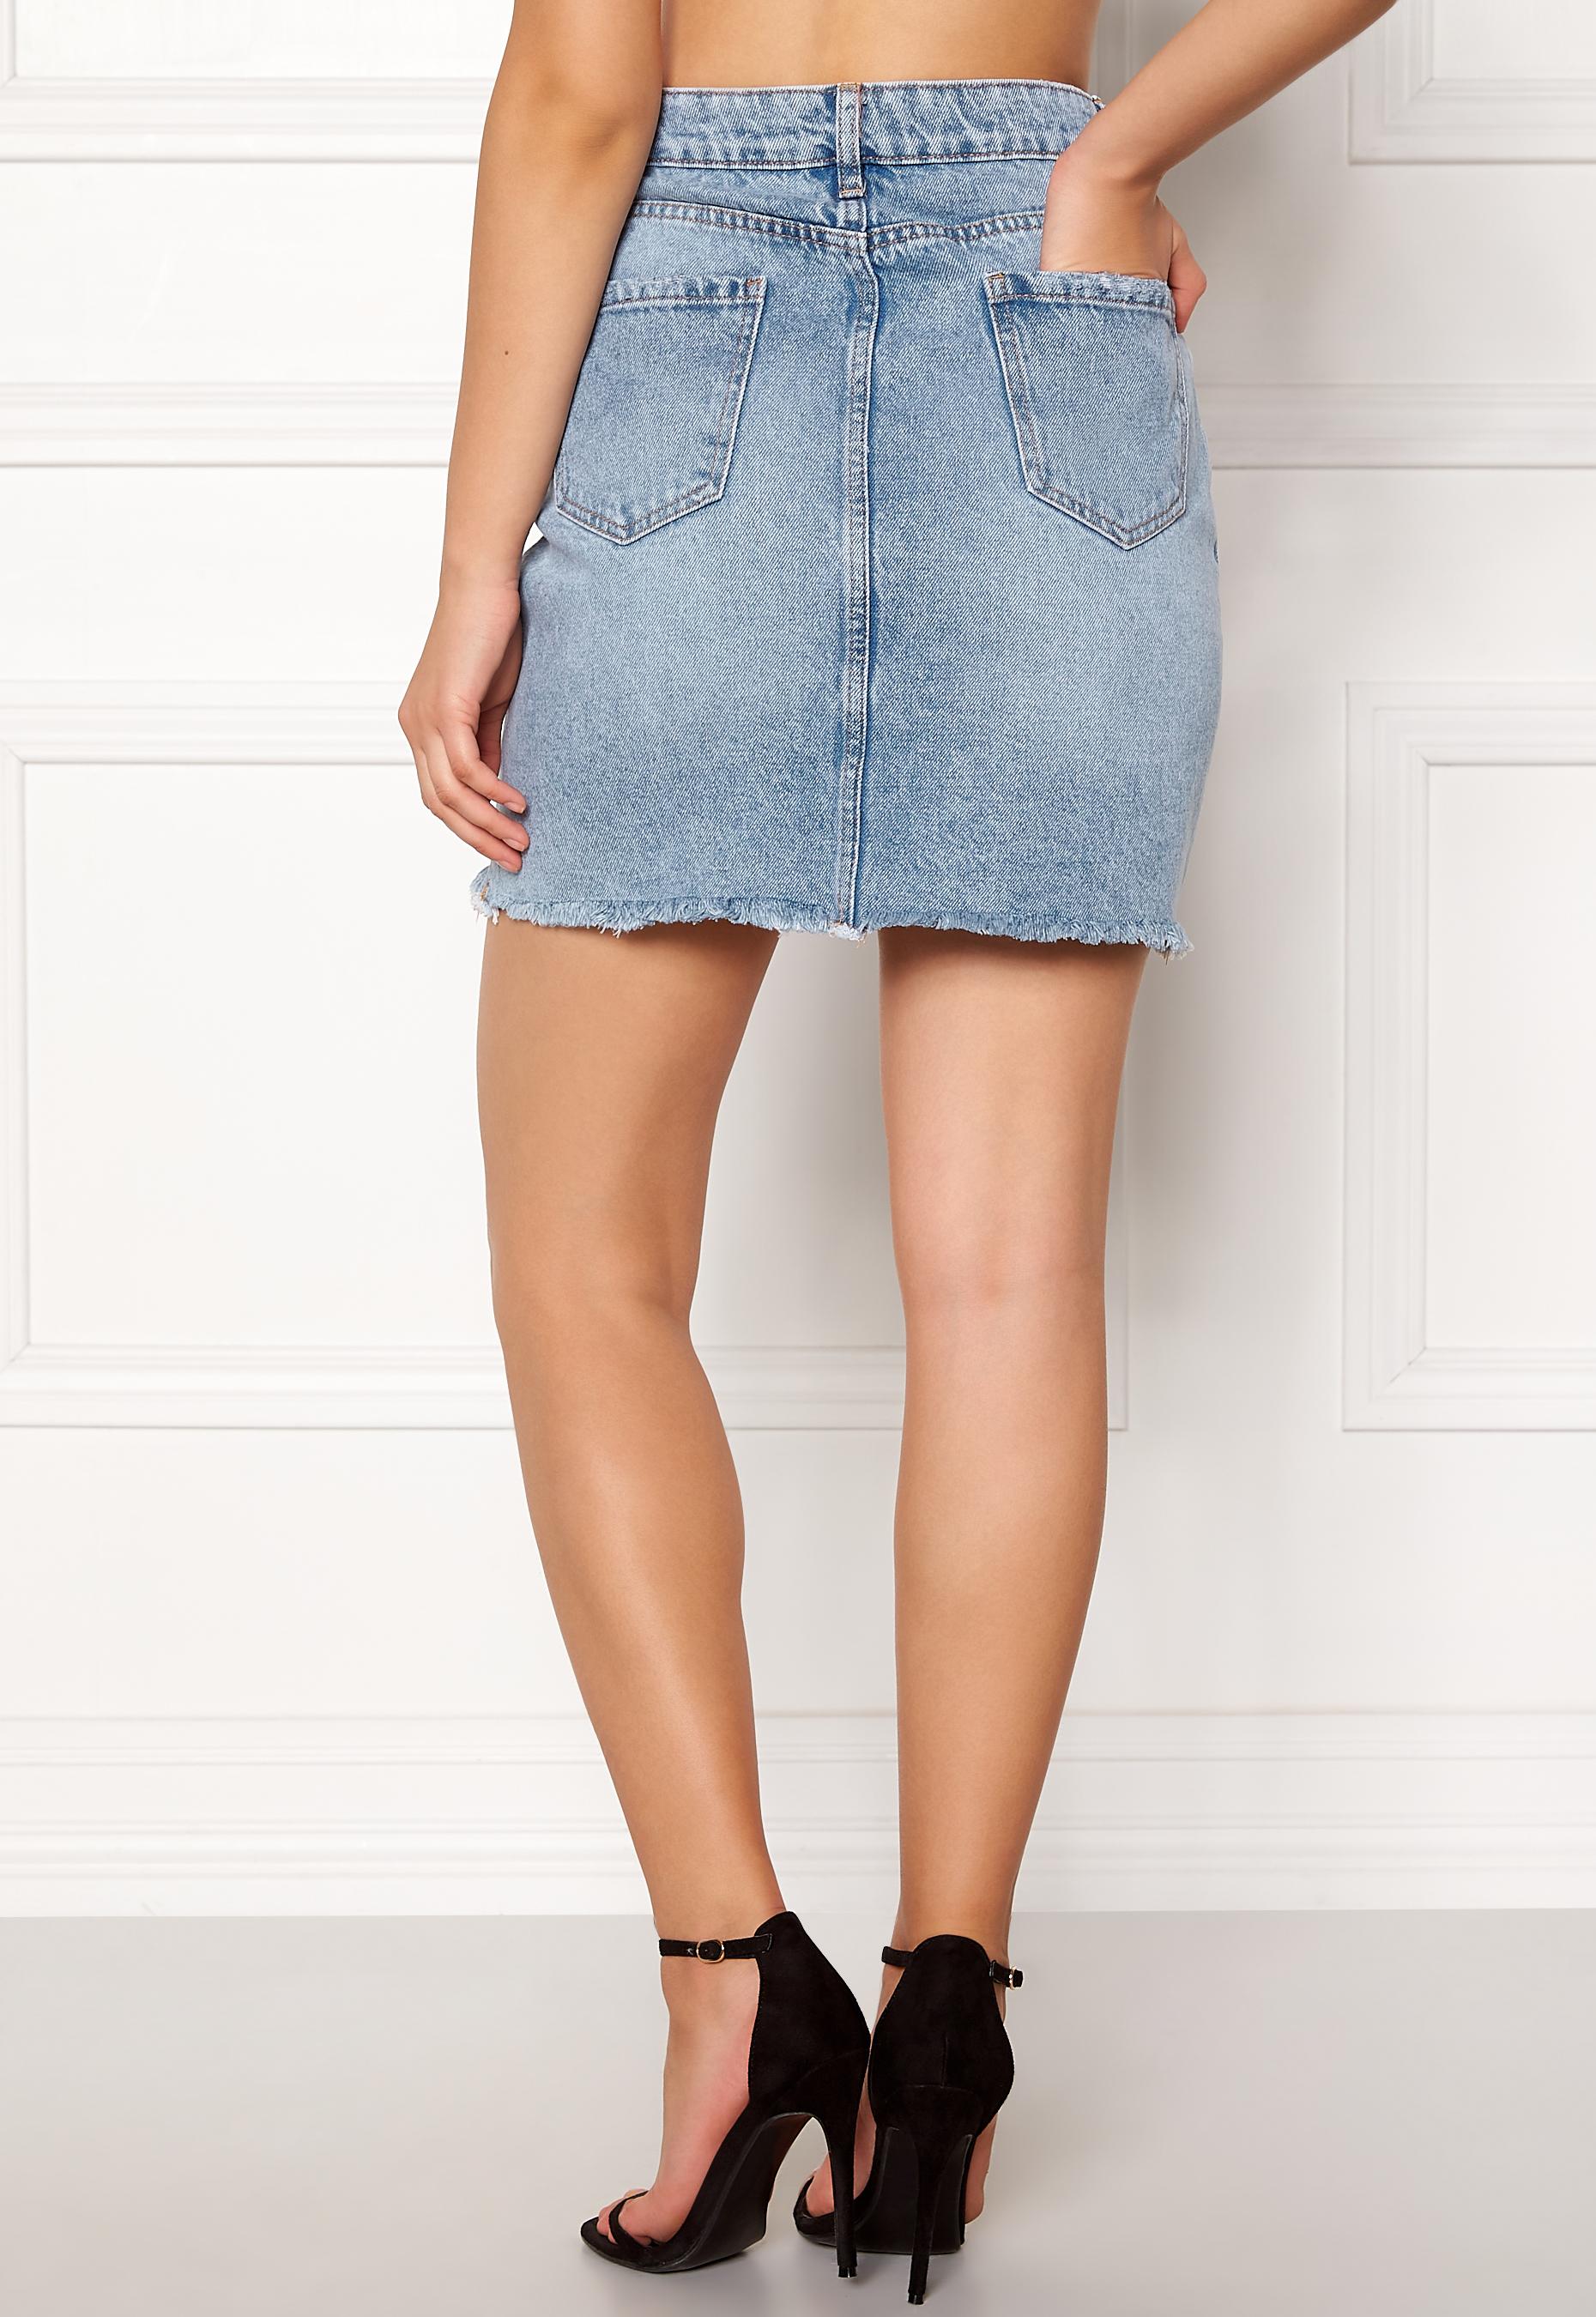 New Look Harvey Cut Off Skirt Wedgewood - Bubbleroom 5dd68b3d1f18